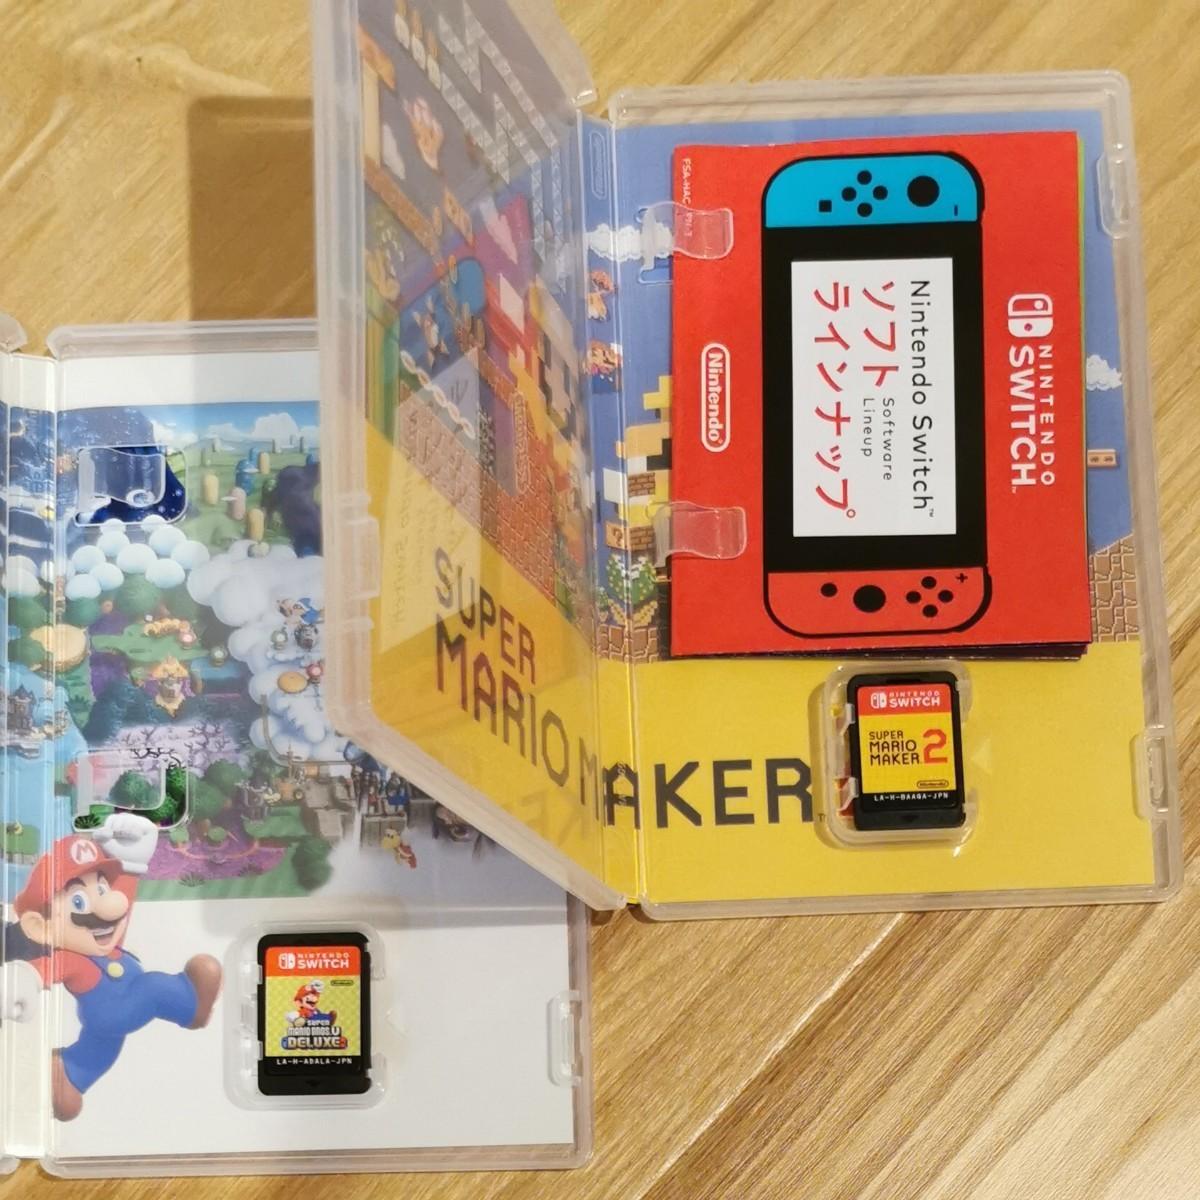 Nintendo Switch NewスーパーマリオブラザーズU  スーパーマリオメーカー2 セット